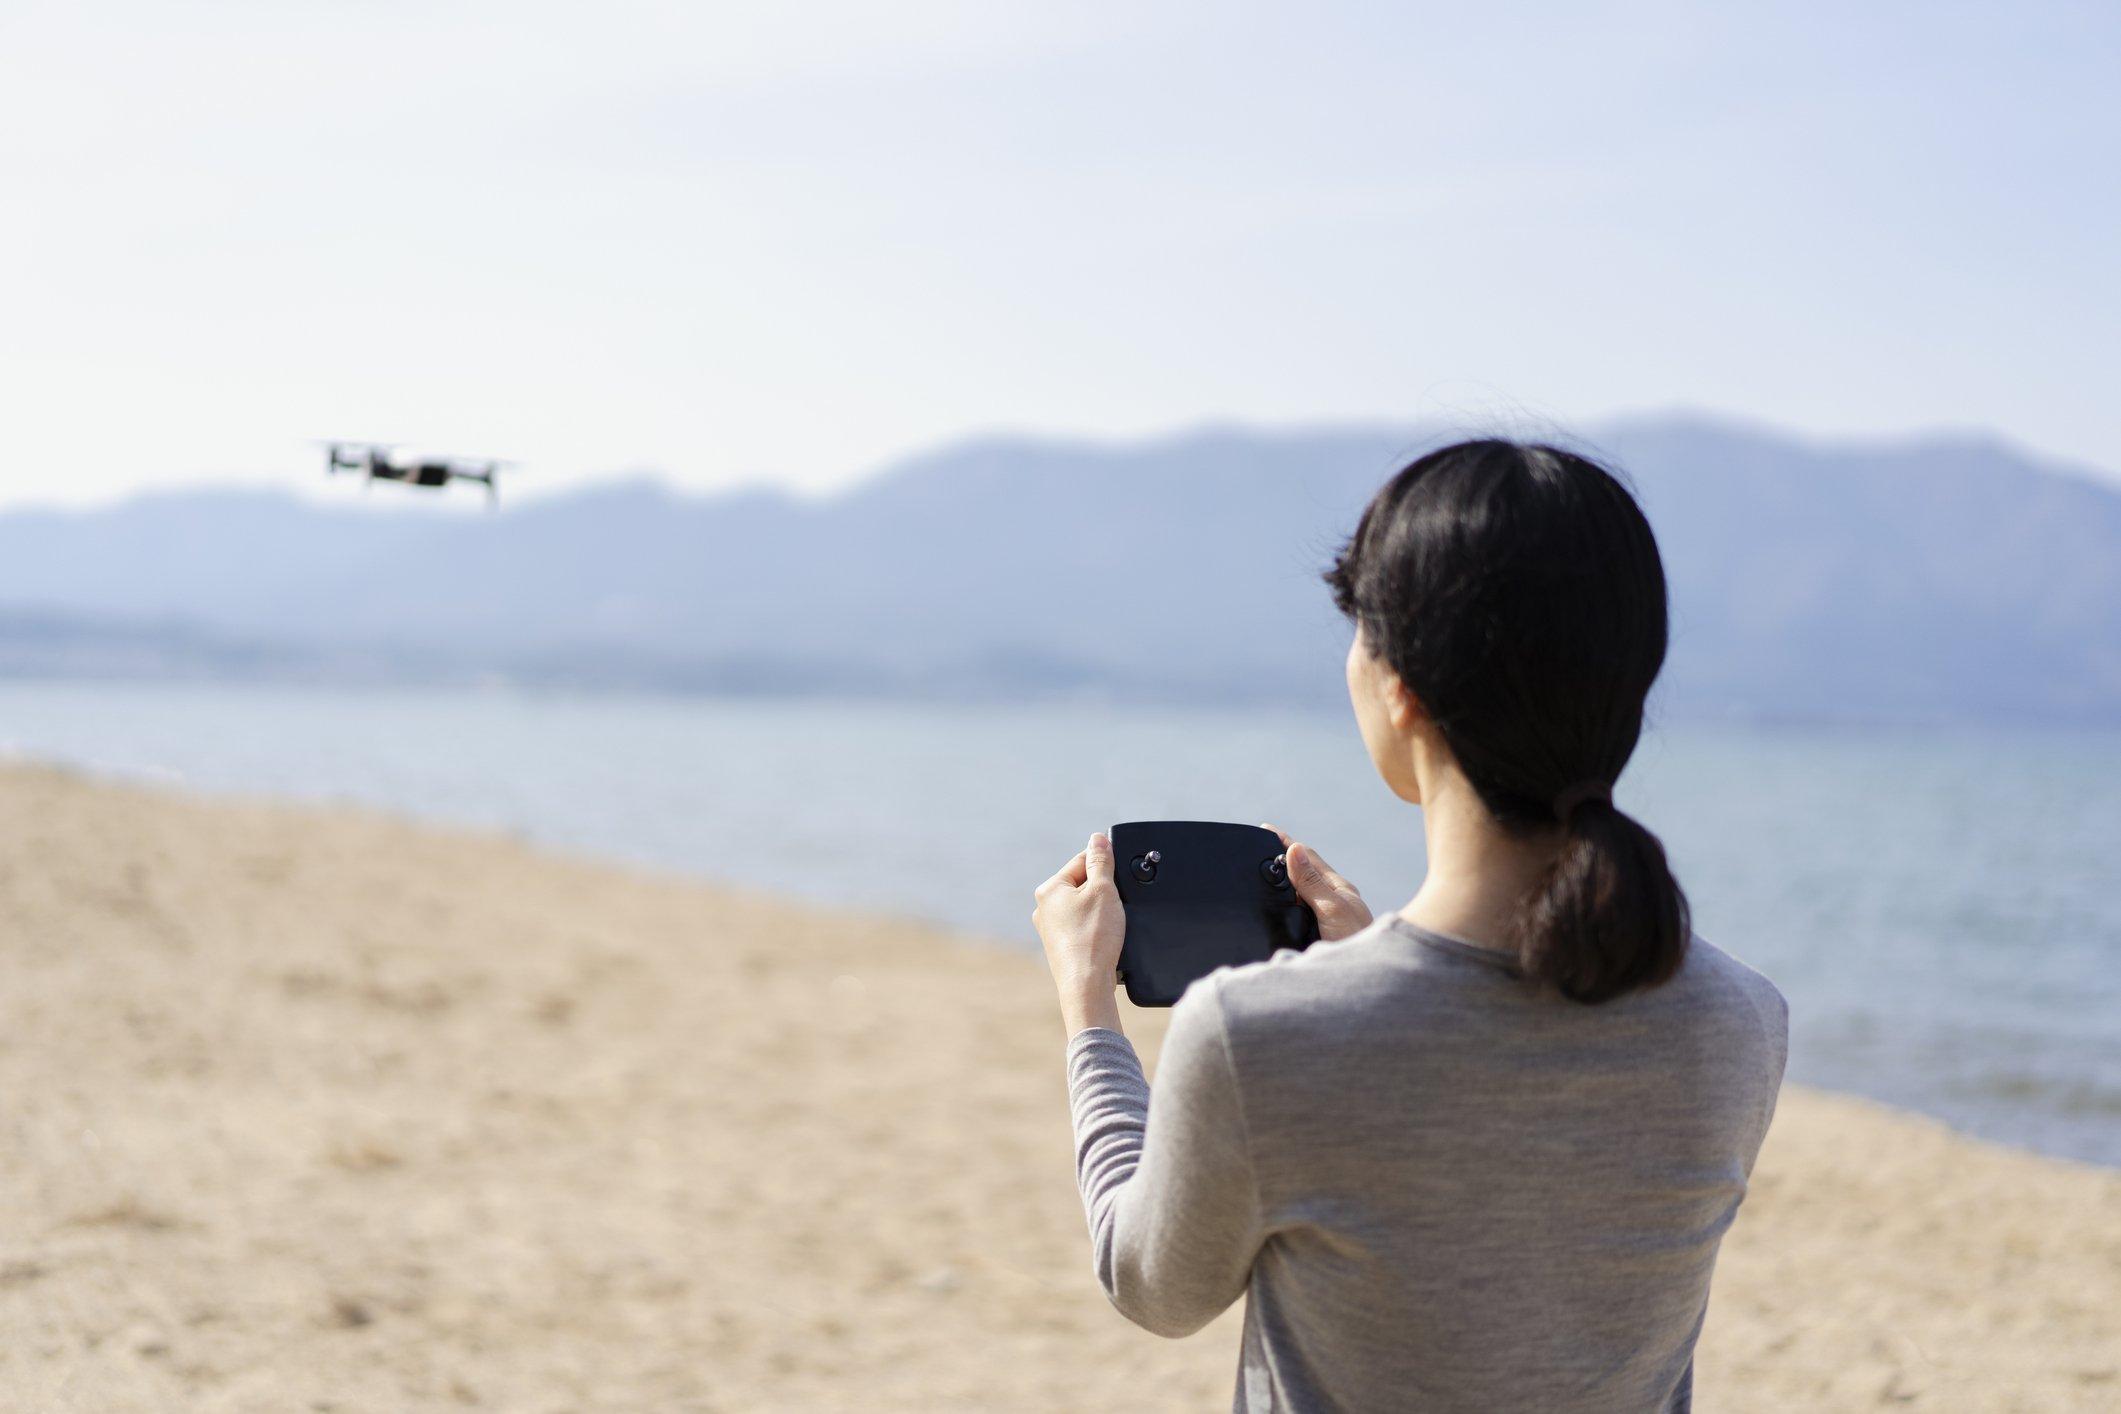 milestone drone industry woman female pilot FAA